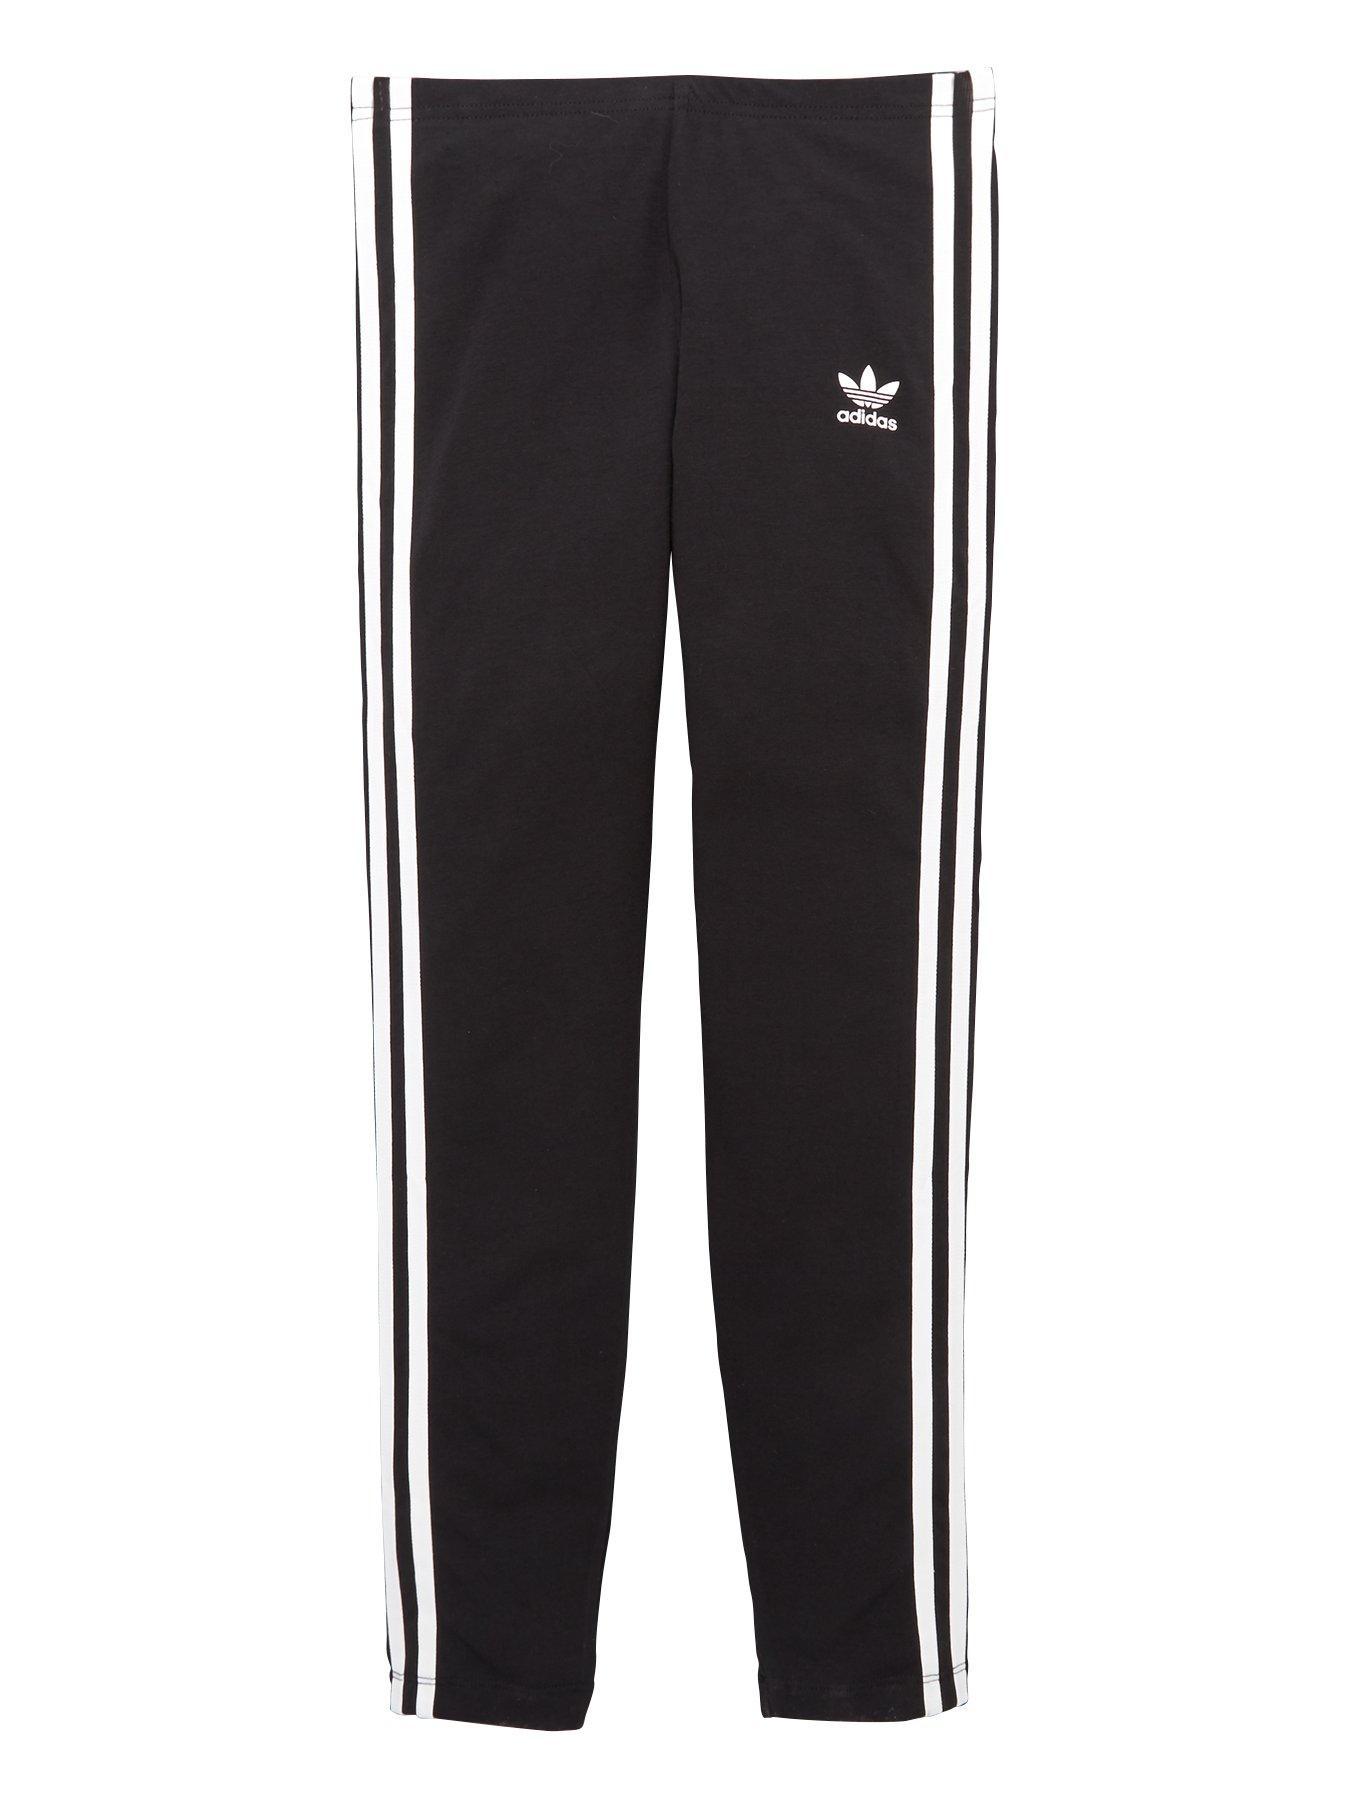 354aa57ec25 ireland womens adidas superstar outfit 67b46 72d73  new zealand adidas  originals adidas originals girls three stripe cotton leggings c31a7 6d385